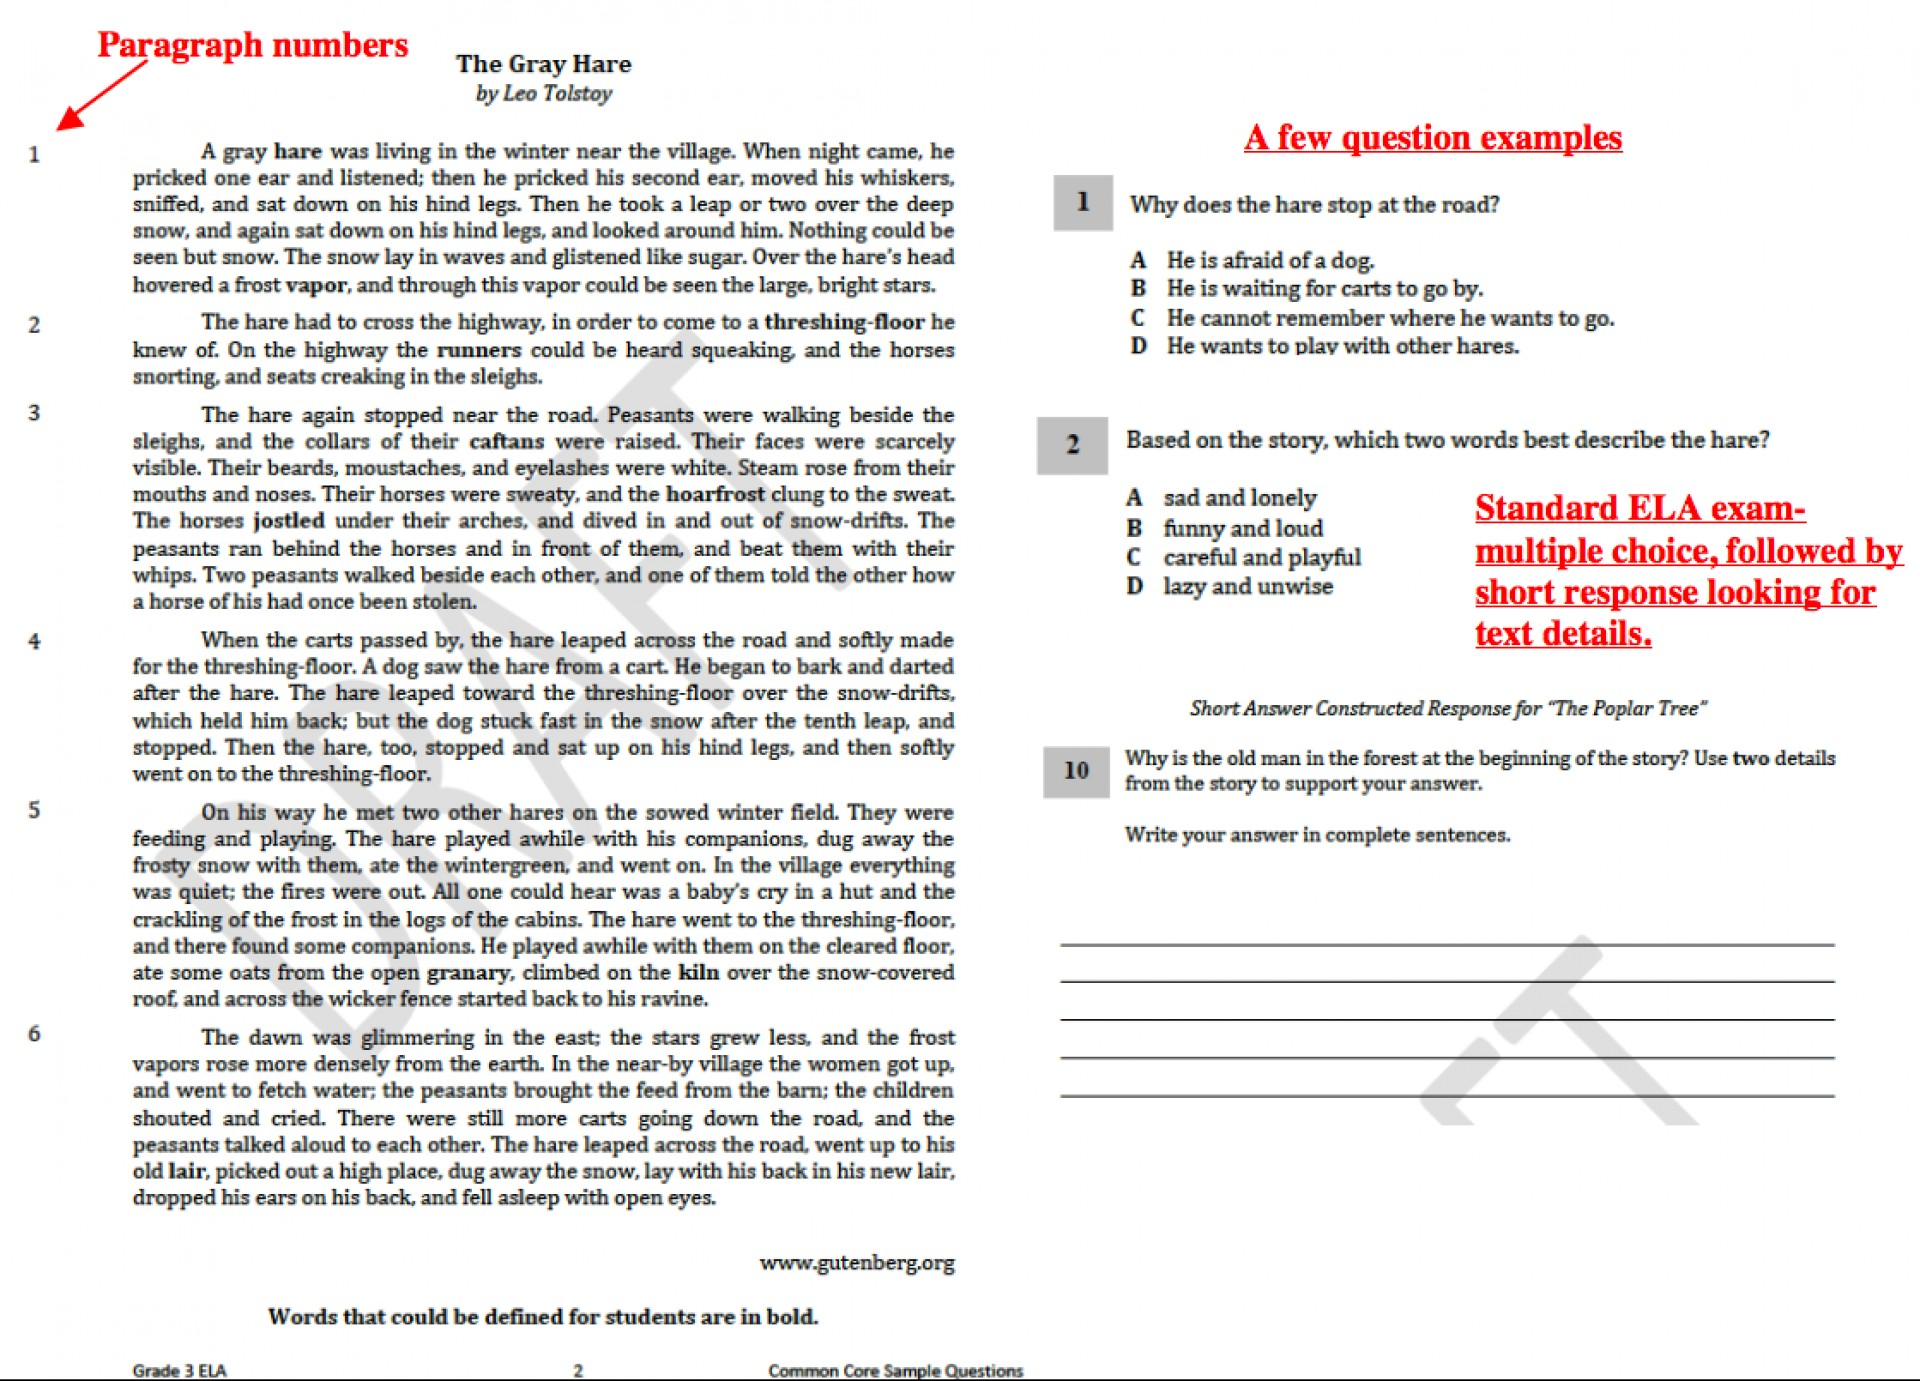 001 Common Core Essay Questions 3rd Grade Ela Marvelous 2017 1920